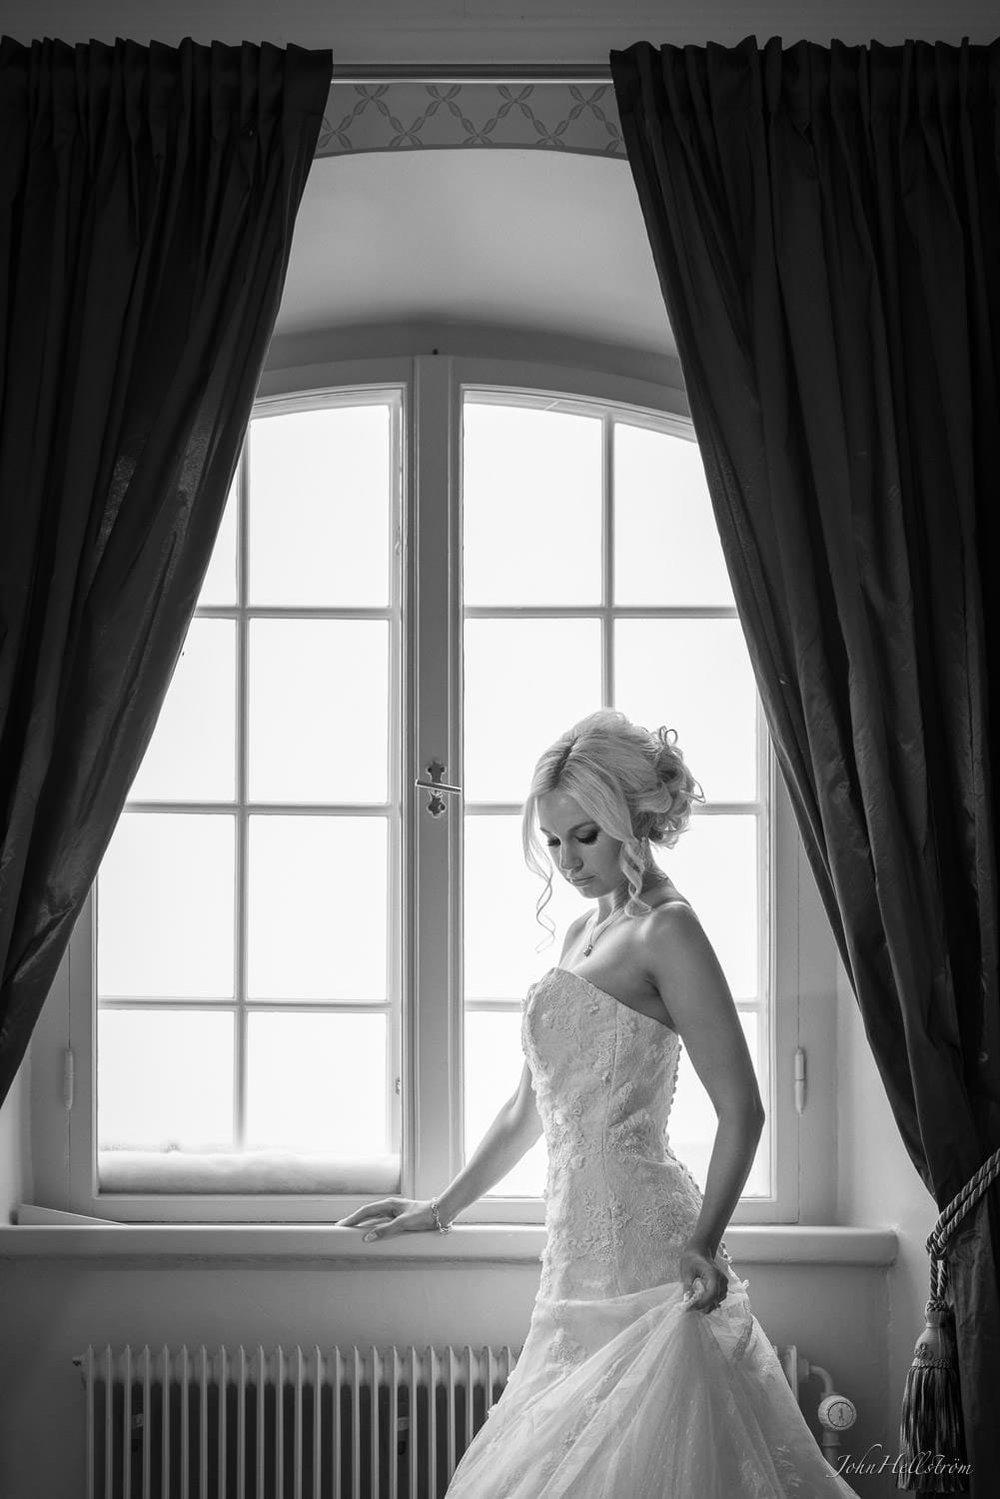 wedding-photographer-brollop-fotograf-brollopsfotograf-stockholm-grebbestad-00015.jpg